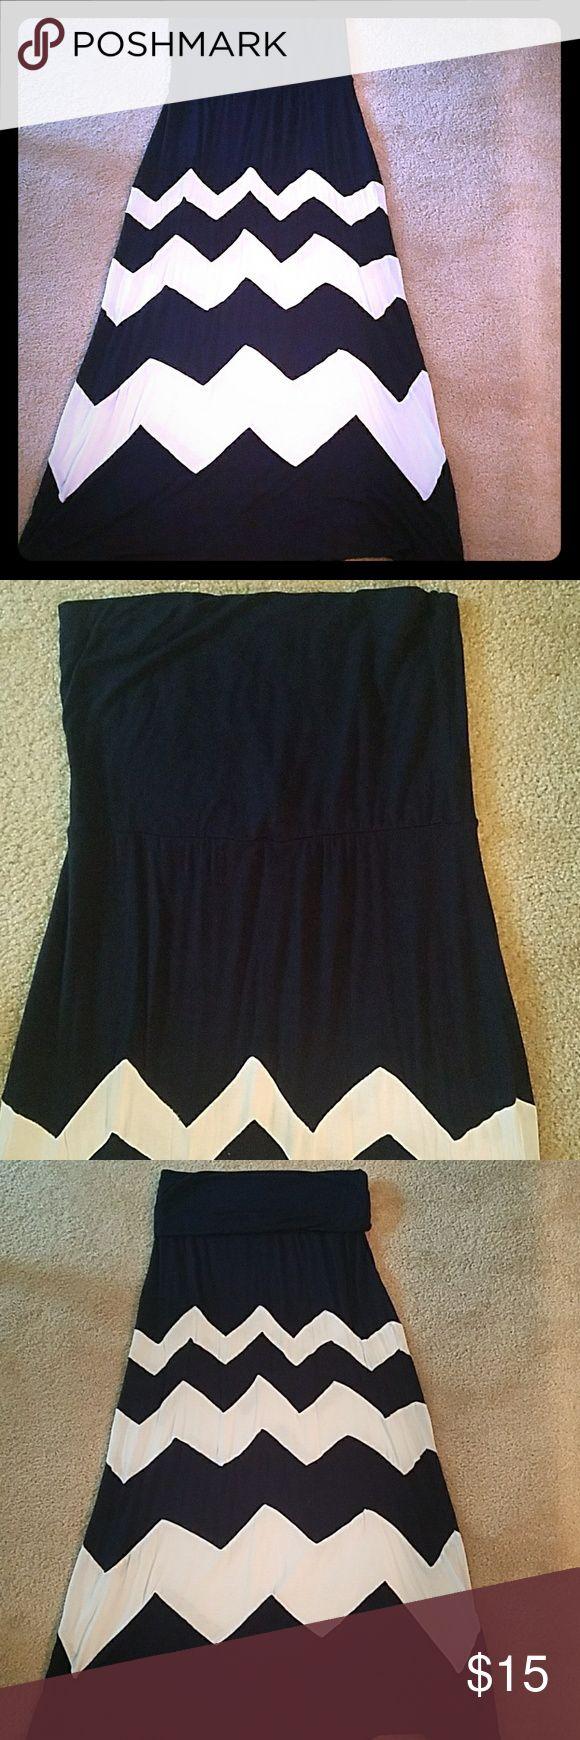 Maxi Navy Chevron dress Maxi tube top dress or long skirt. Navy /white Chevron print. Size Large. brand:Charming Charlie Charming Charlie Dresses Maxi